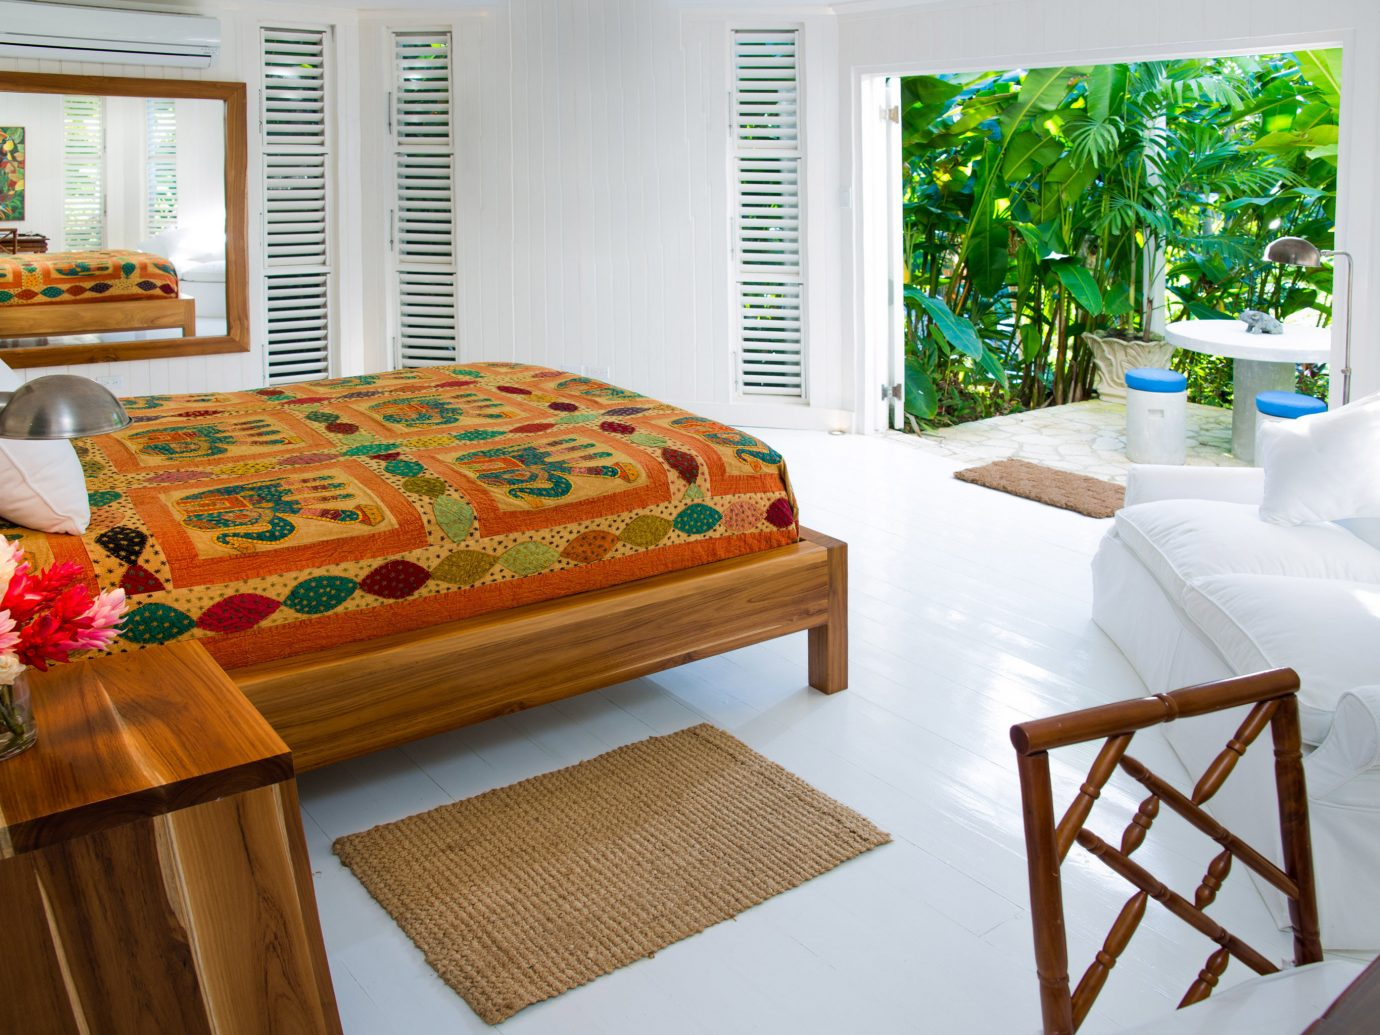 Balcony Bedroom Hotels Living Luxury Tropical indoor table window room furniture bed sheet bed home living room interior design cottage Suite estate Design decorated